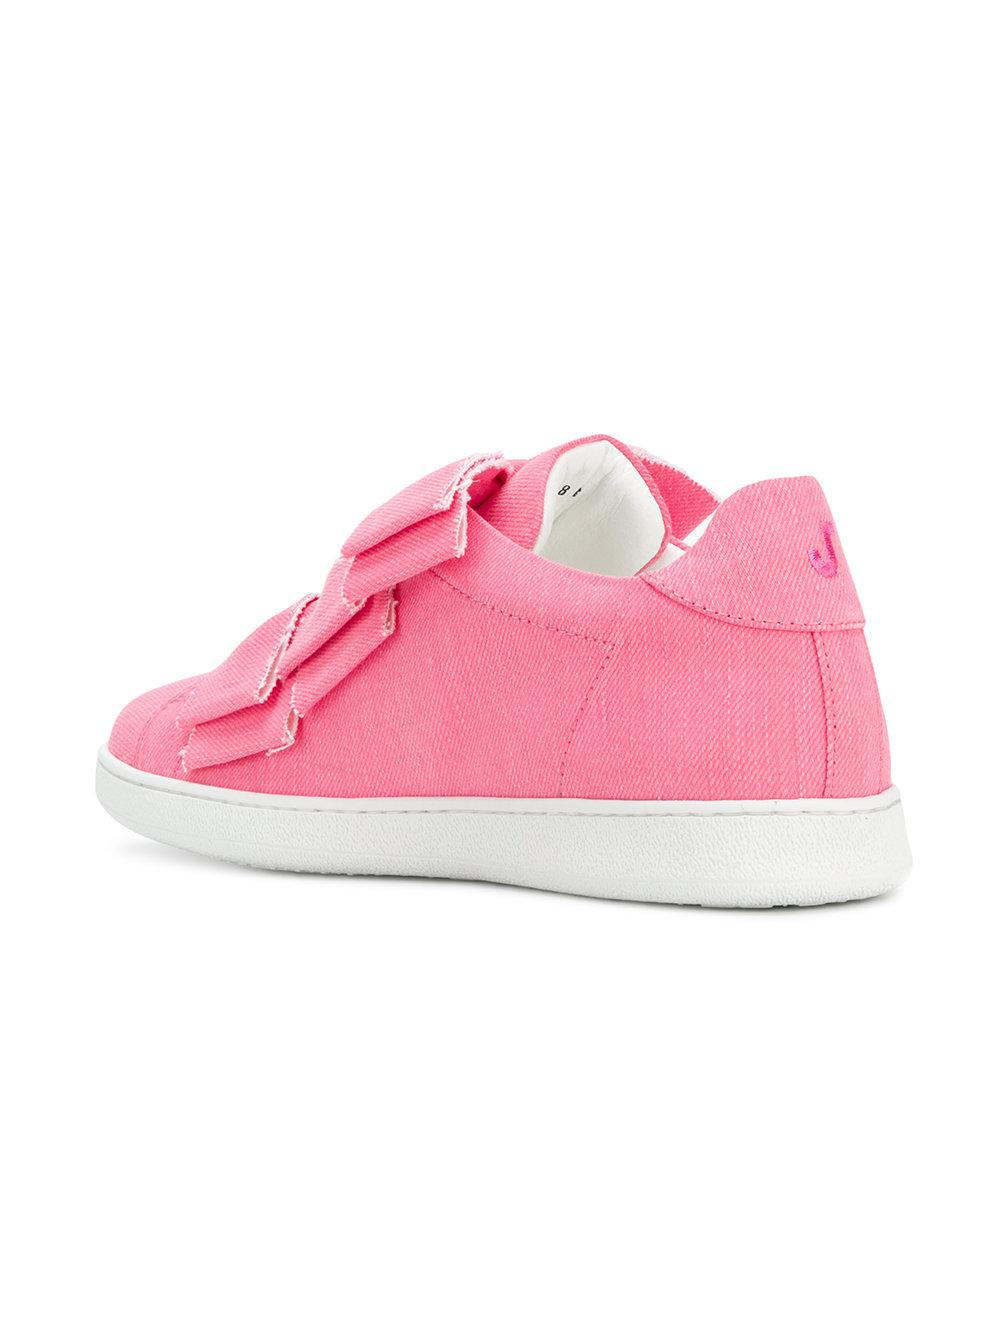 denim bow-embellished sneakers - Pink & Purple Joshua Sanders KpZA57